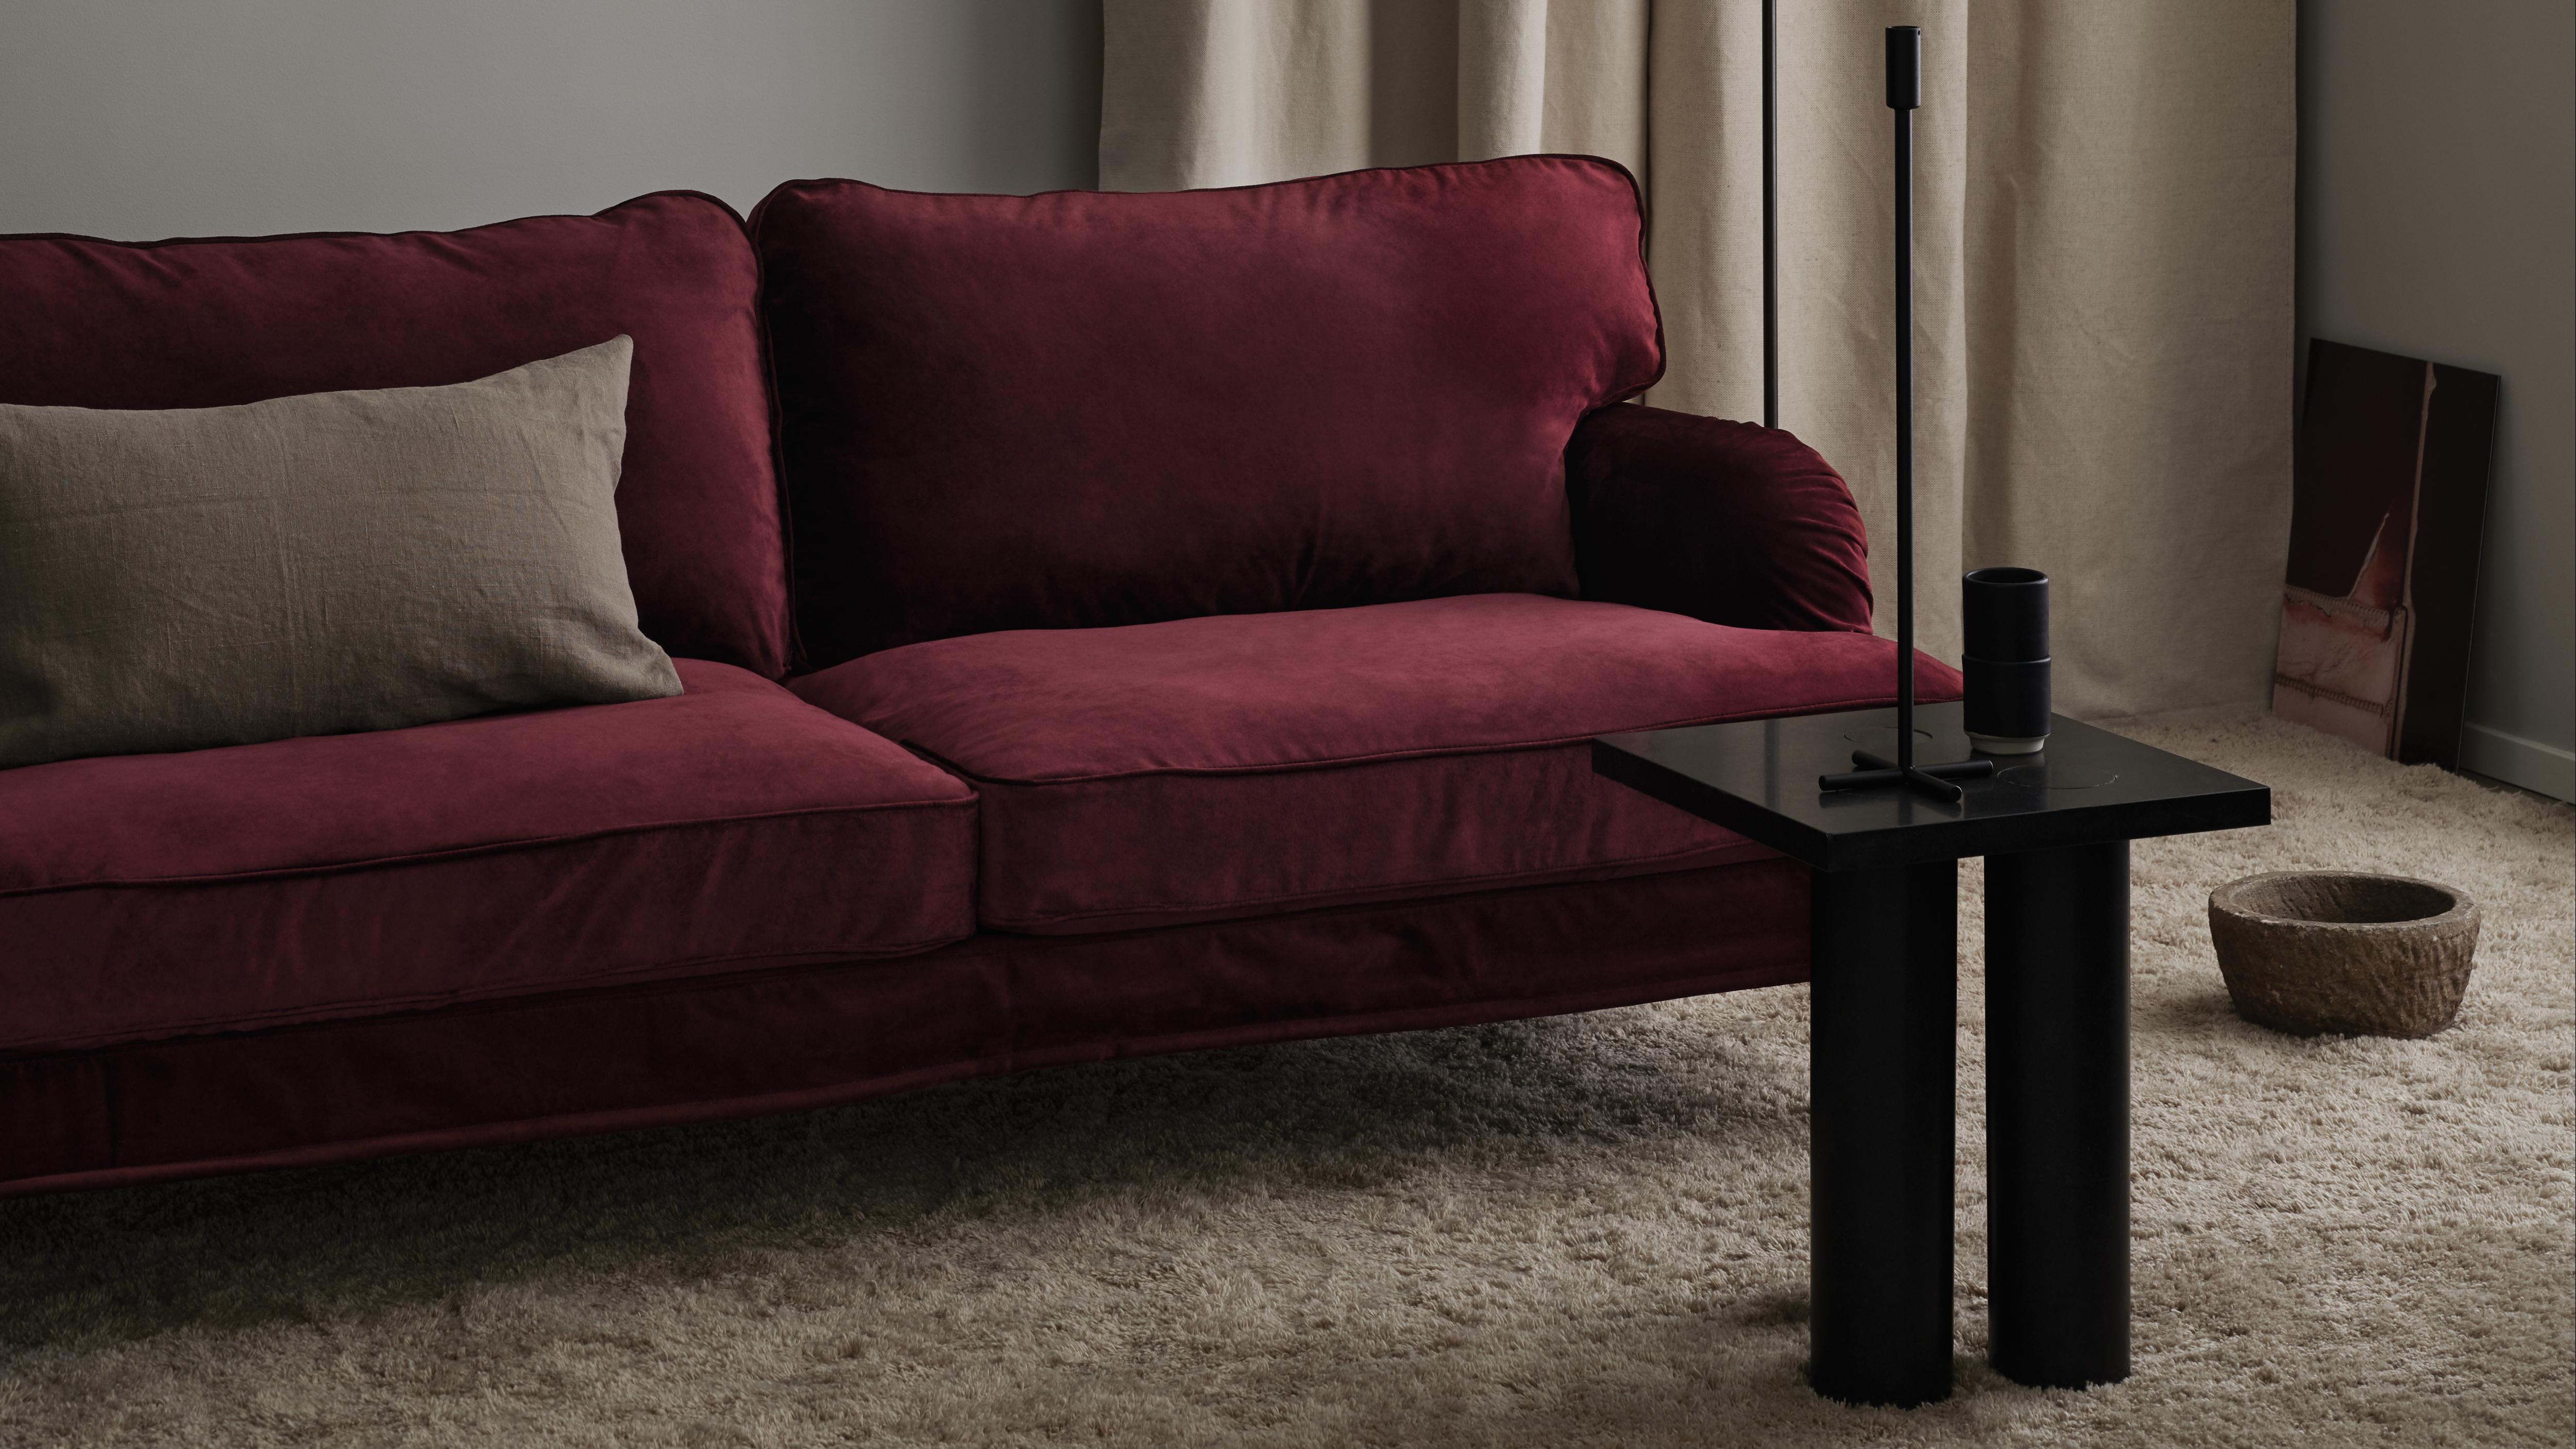 Outstanding Ikea Stocksund Sofa Review By Bemz Bemz Dailytribune Chair Design For Home Dailytribuneorg